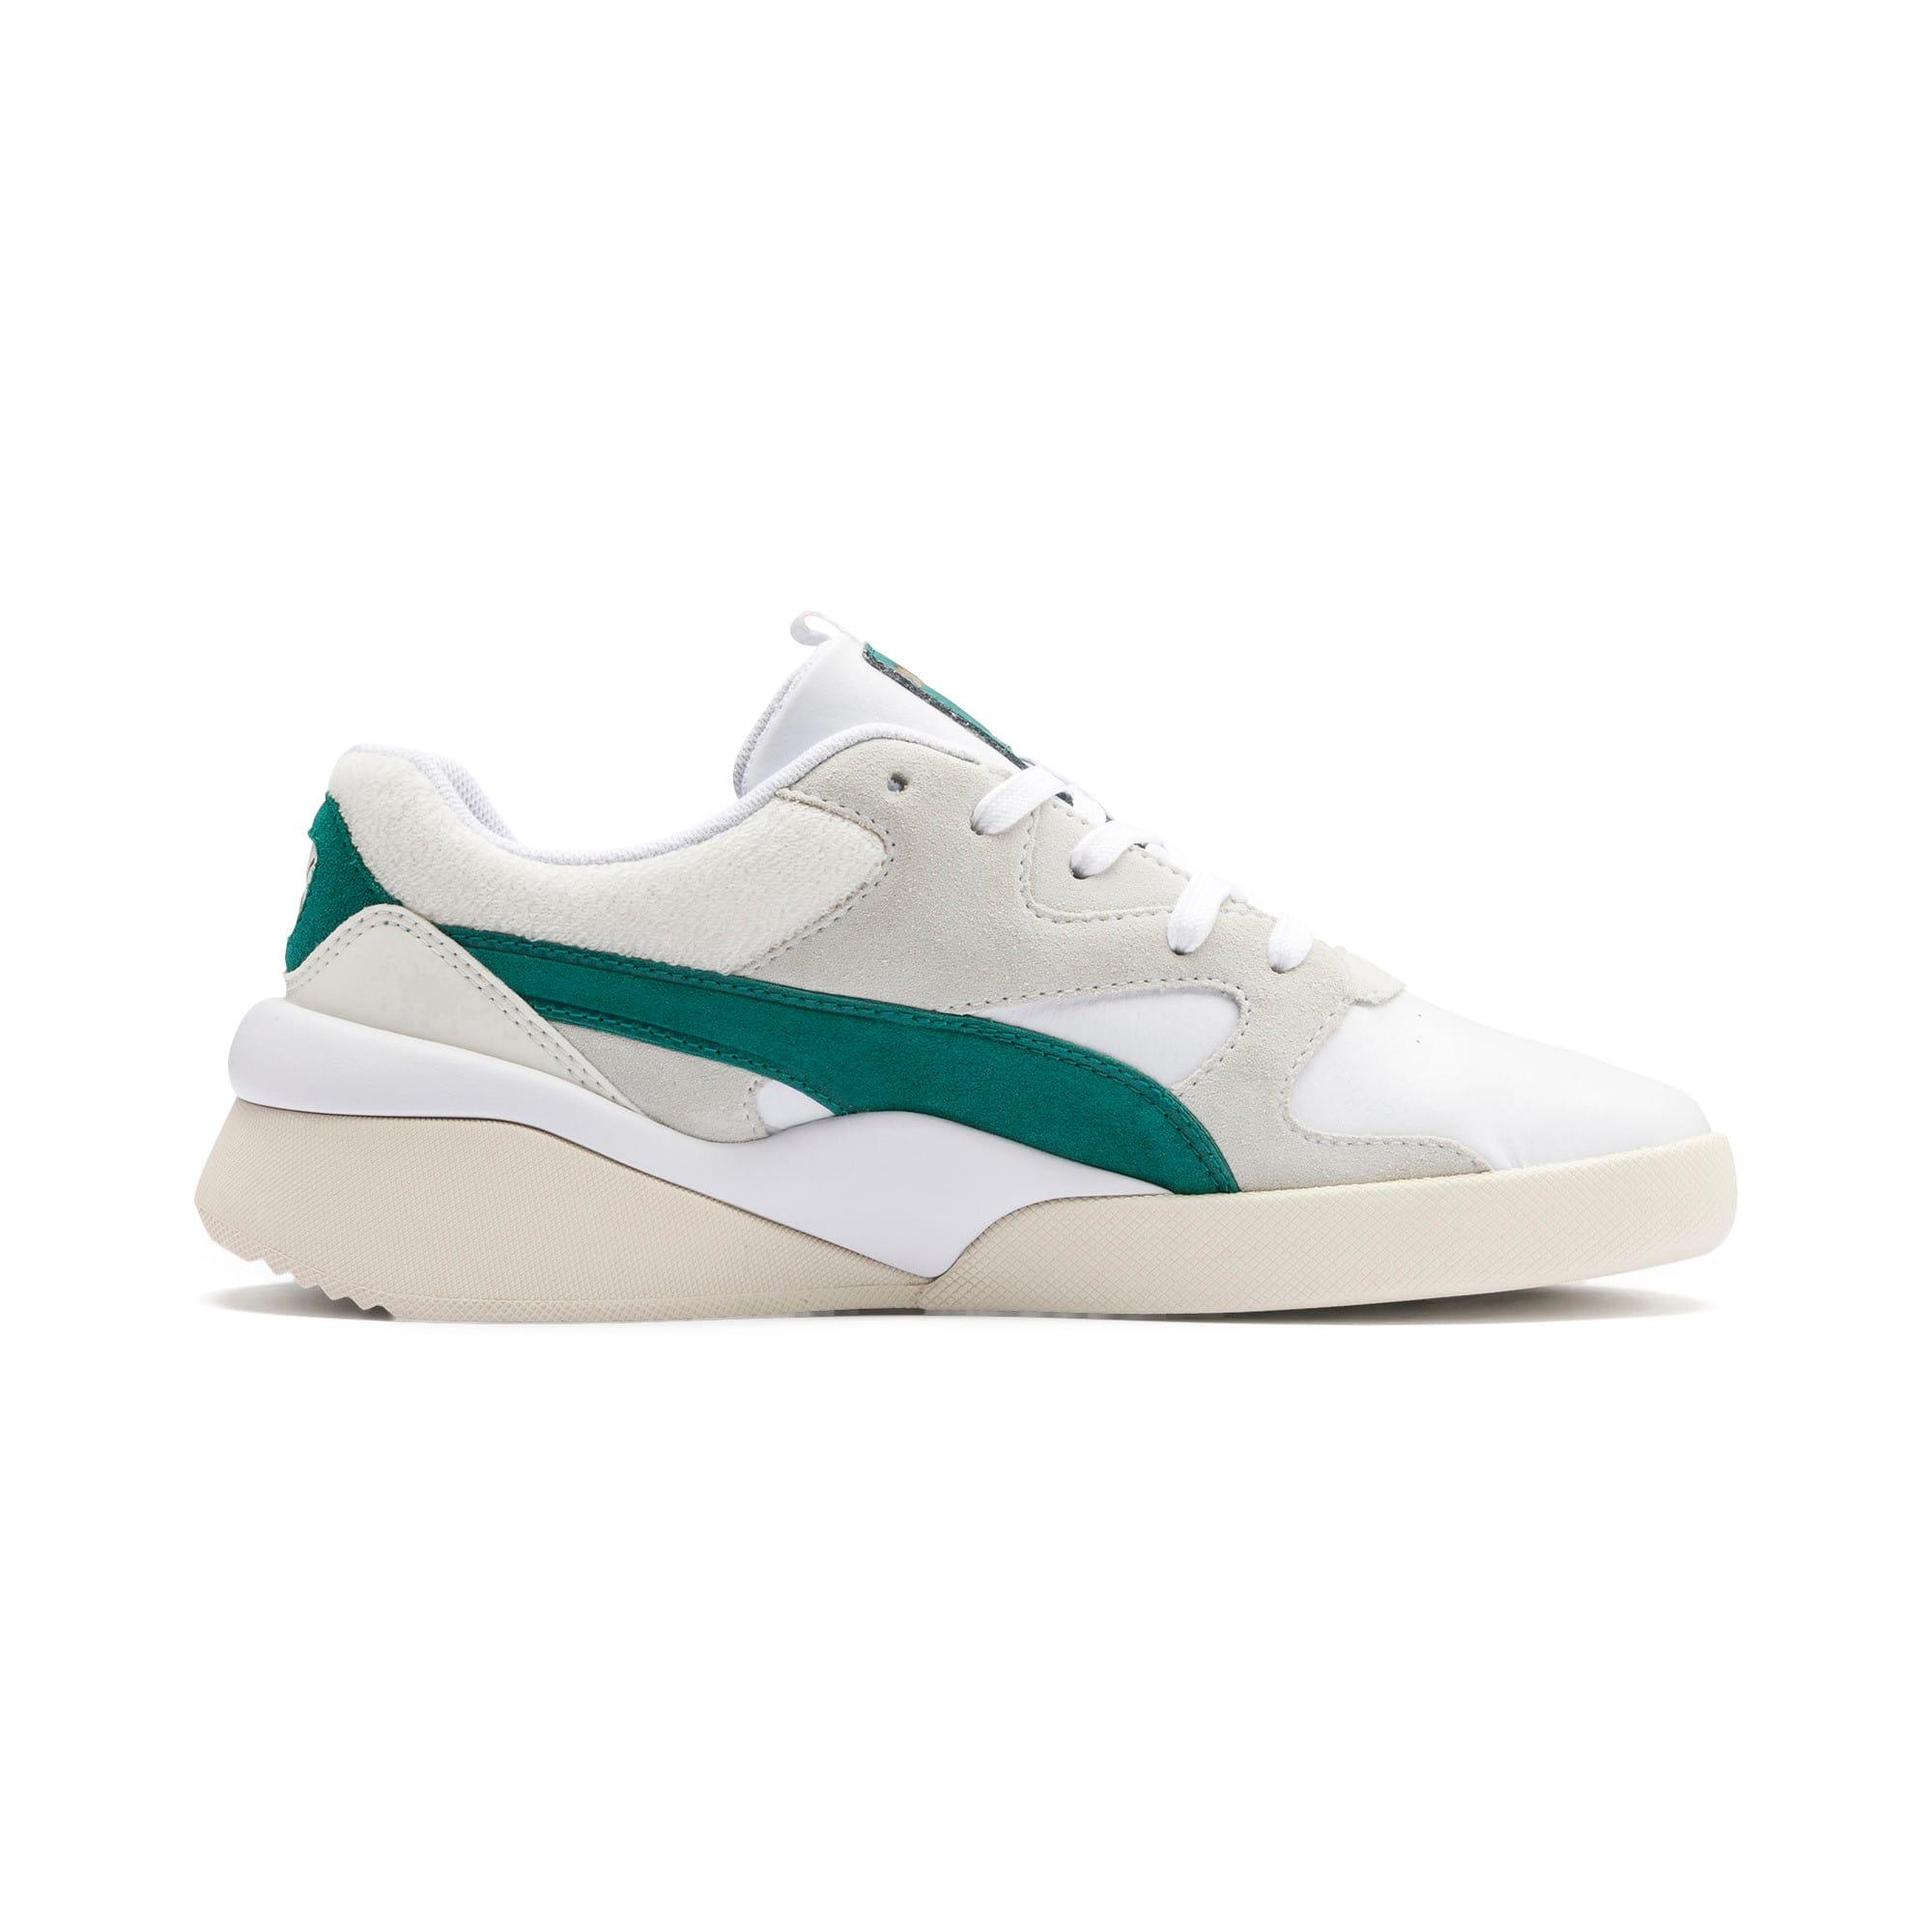 Thumbnail 6 of Aeon Heritage Women's Sneakers, Puma White-Teal Green, medium